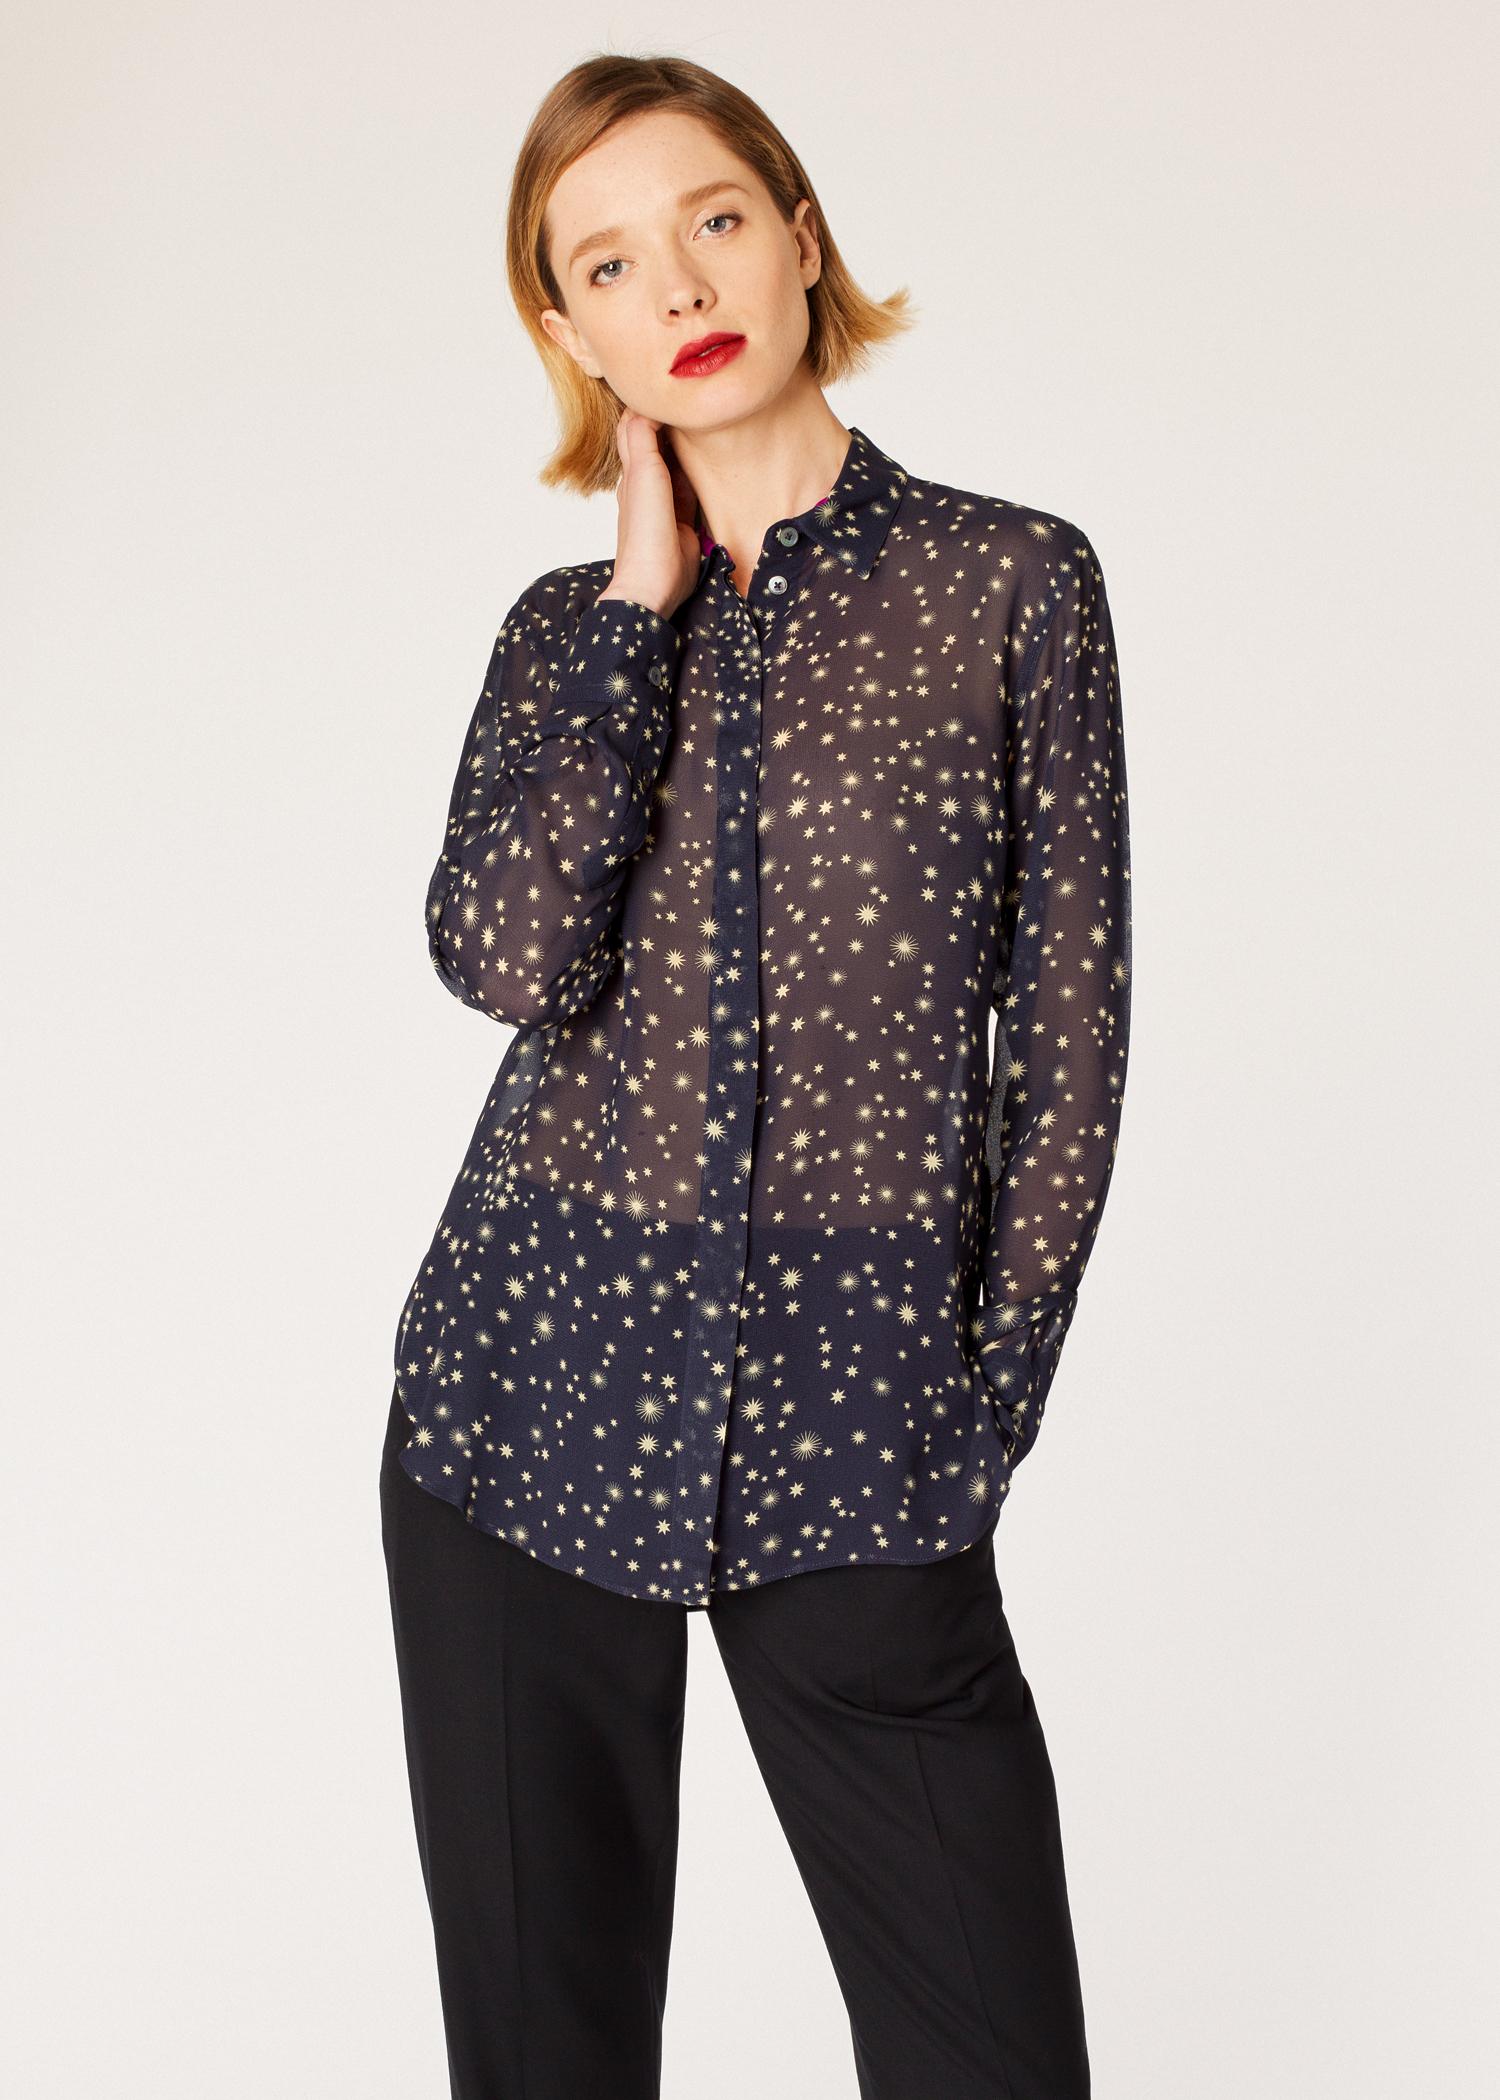 Womens Navy Gold Star Print Chiffon Shirt Paul Smith Us